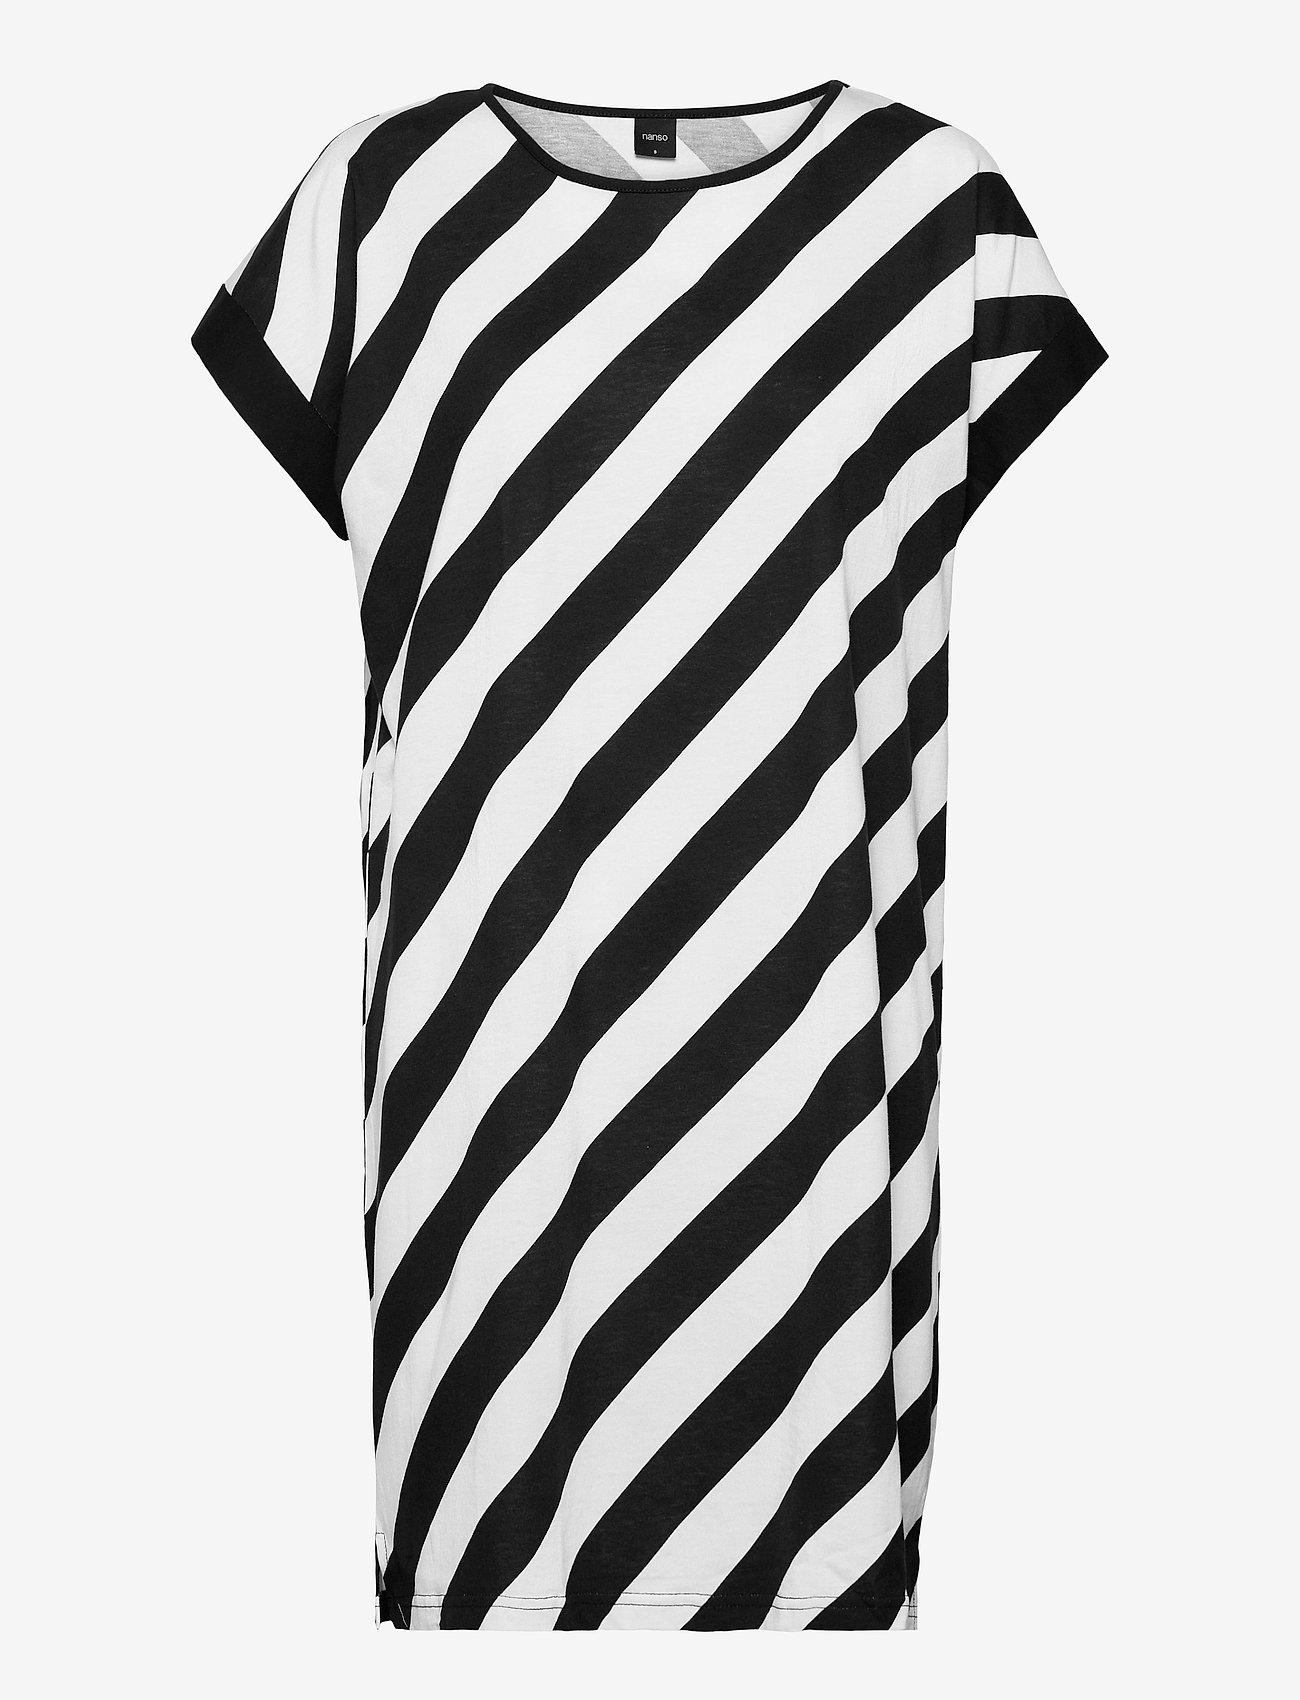 Nanso - Ladies big shirt, Kulma - nightdresses - black and white - 0